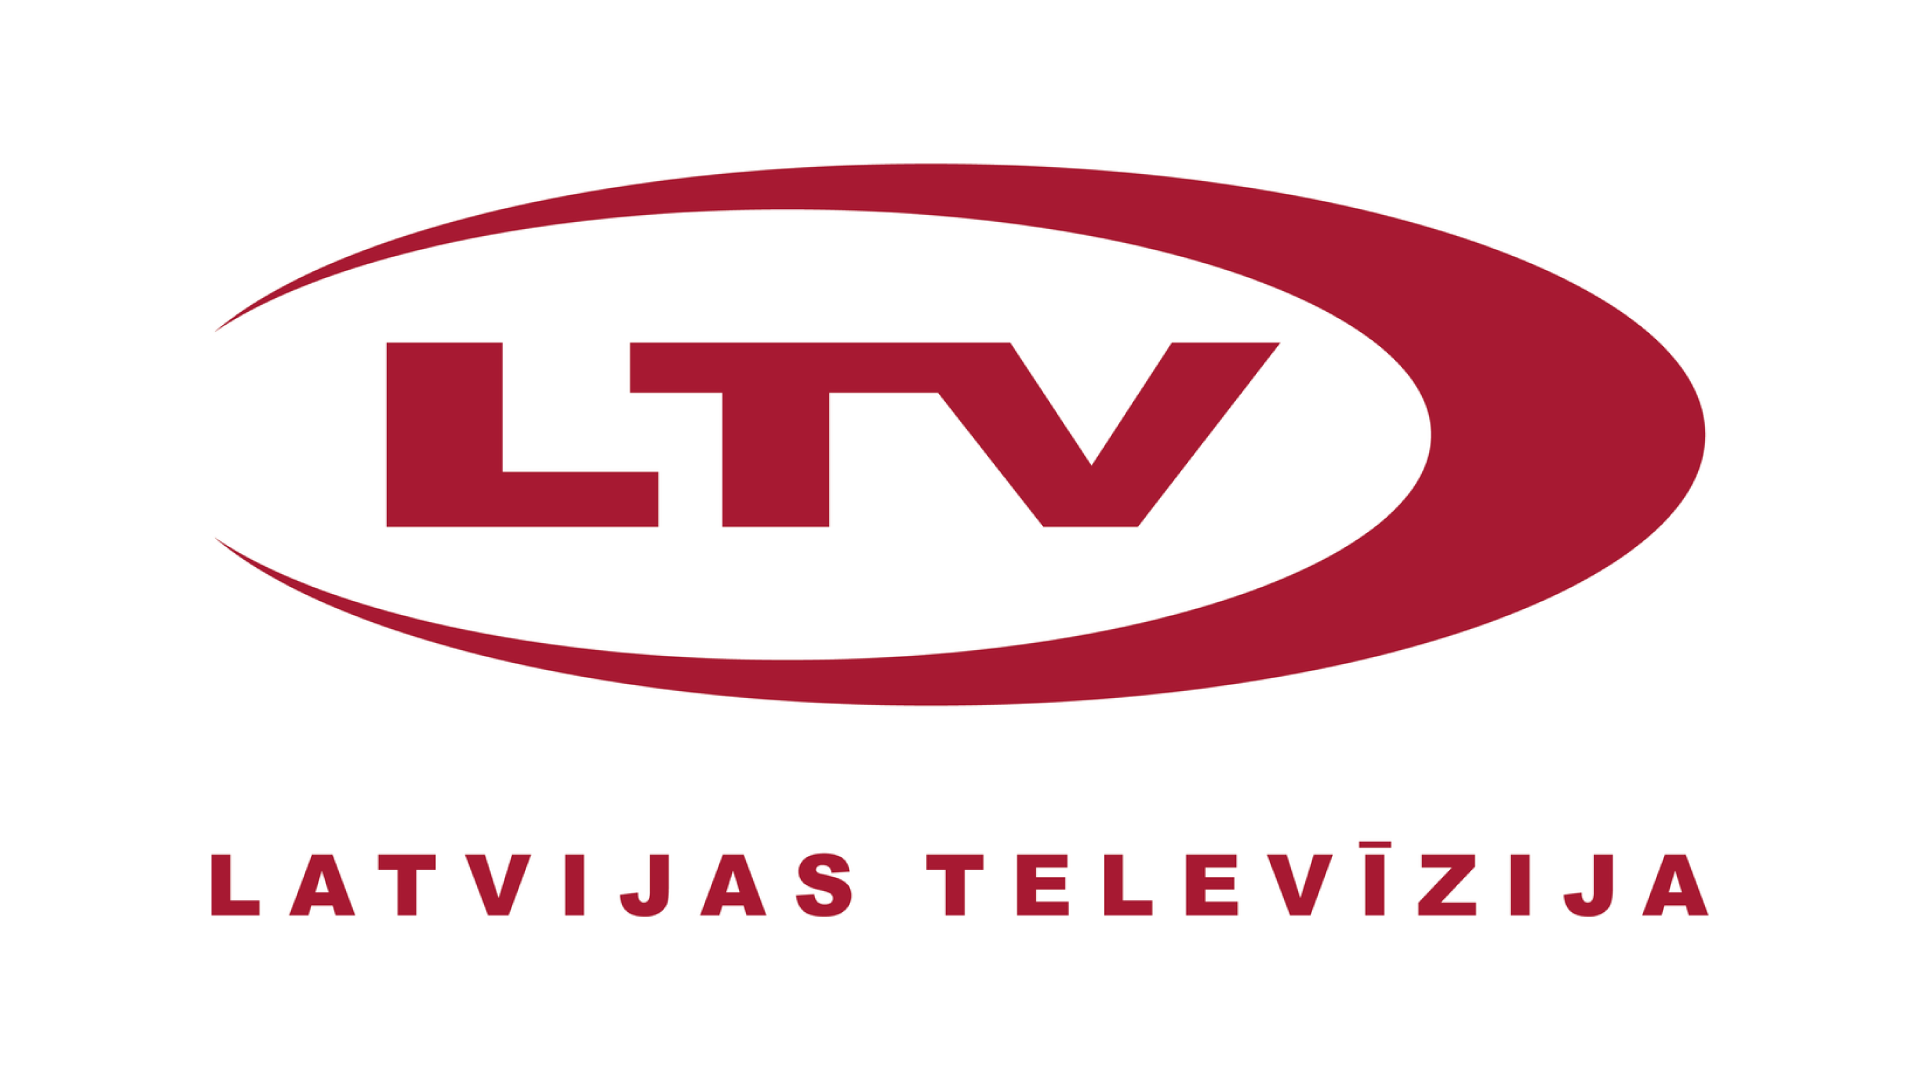 VISIEMLTV.LV Live TV, Online